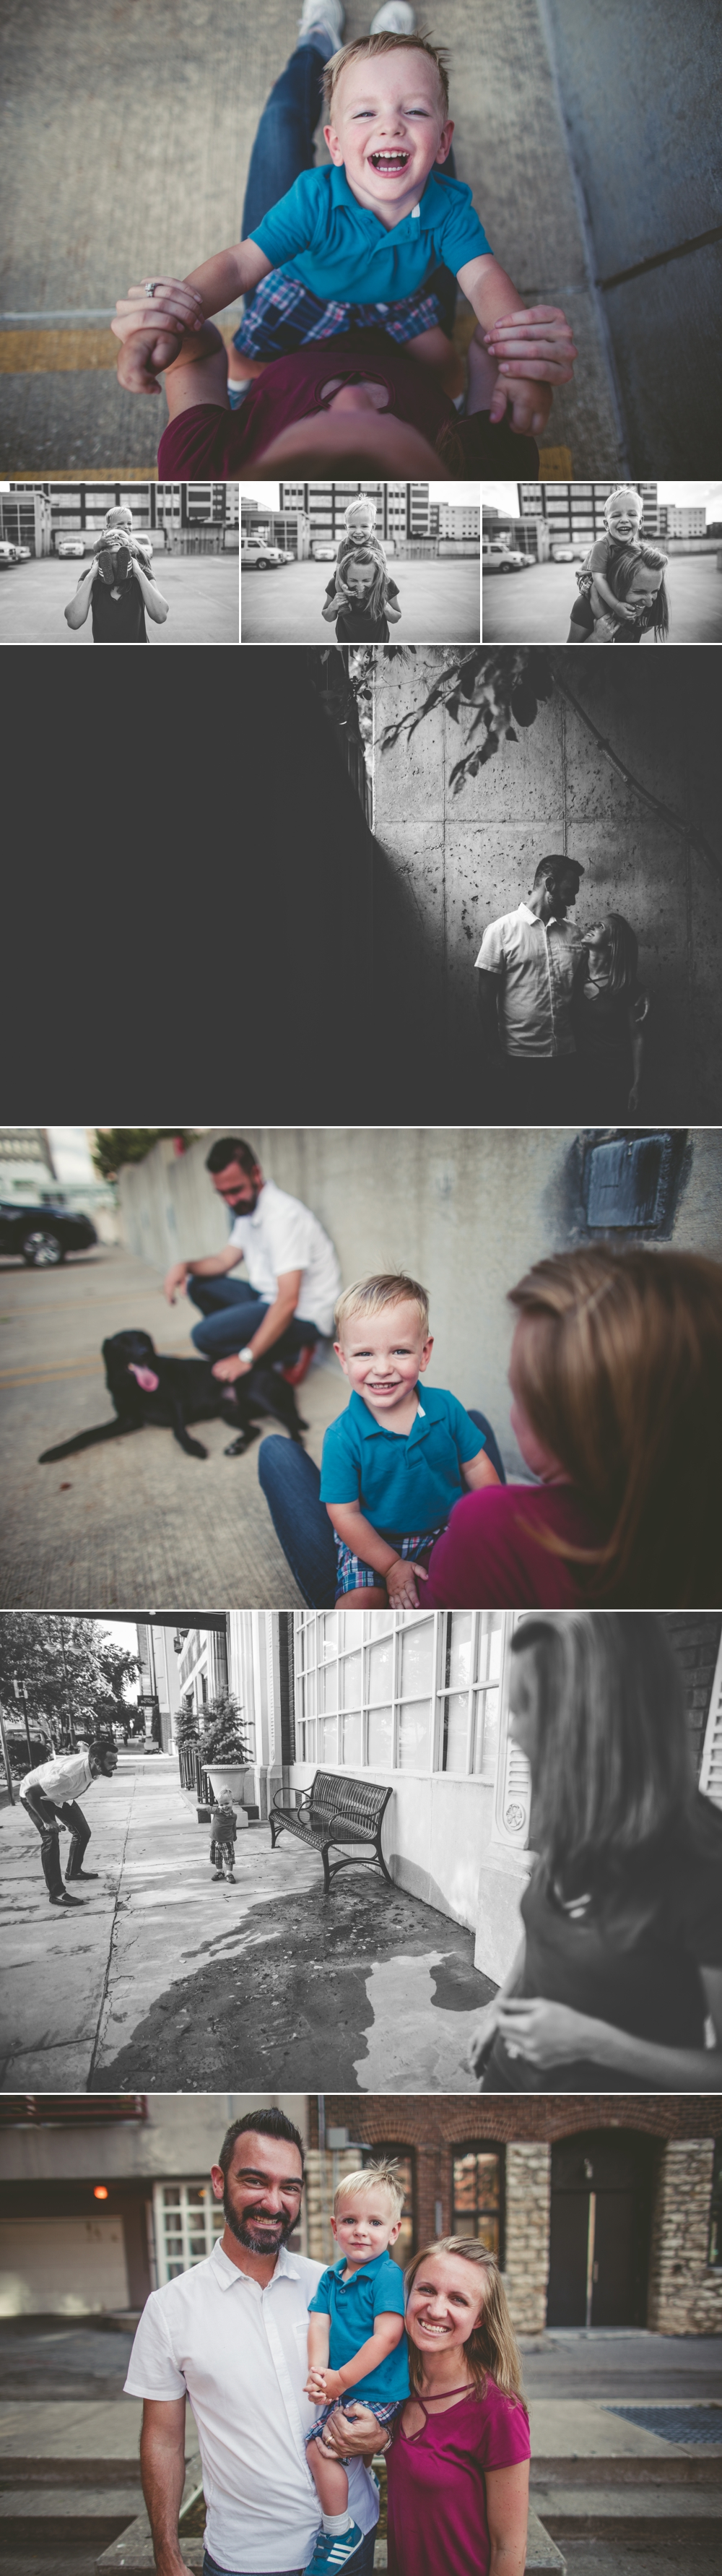 jason_domingues_photography_best_kansas_city_photographer_family_lifestyle_portraits_kc_00021.jpg